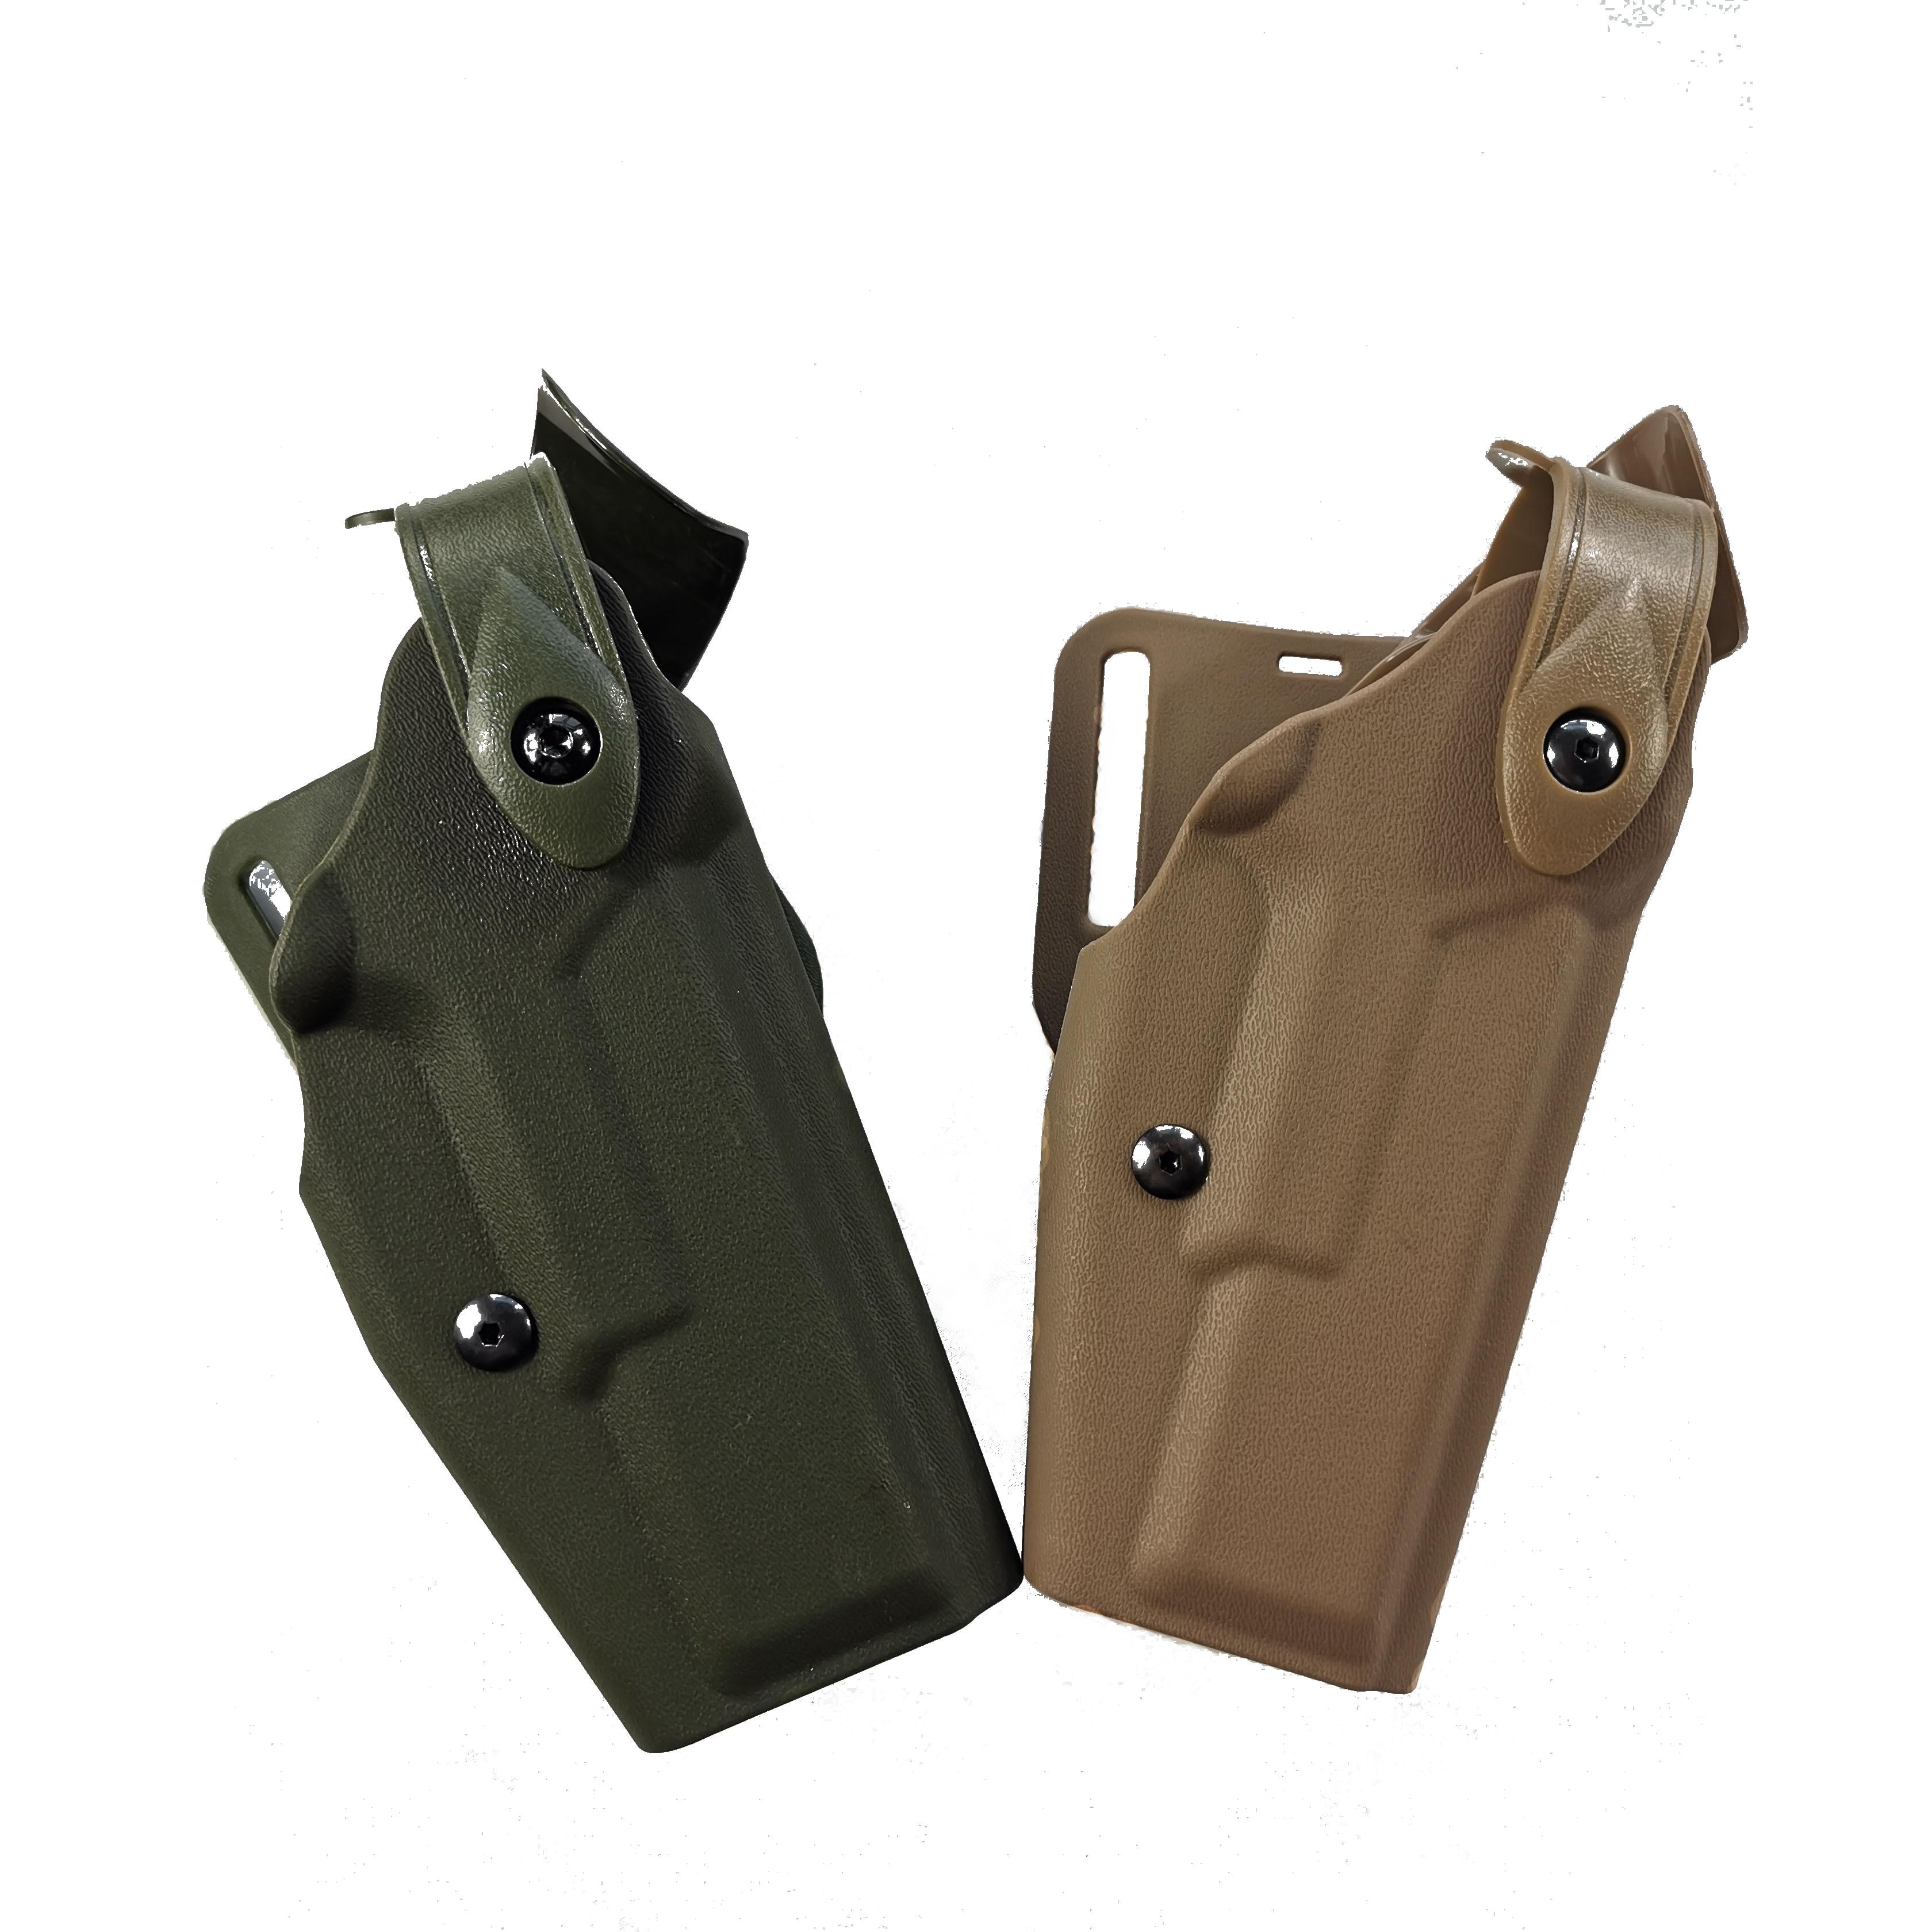 Safariland Tactical Polyurethane Glockck Belt Holster Gl0ck Pistol Waist Holster Glock 17 19 22 23 31 32 Airsoft Gun Holster